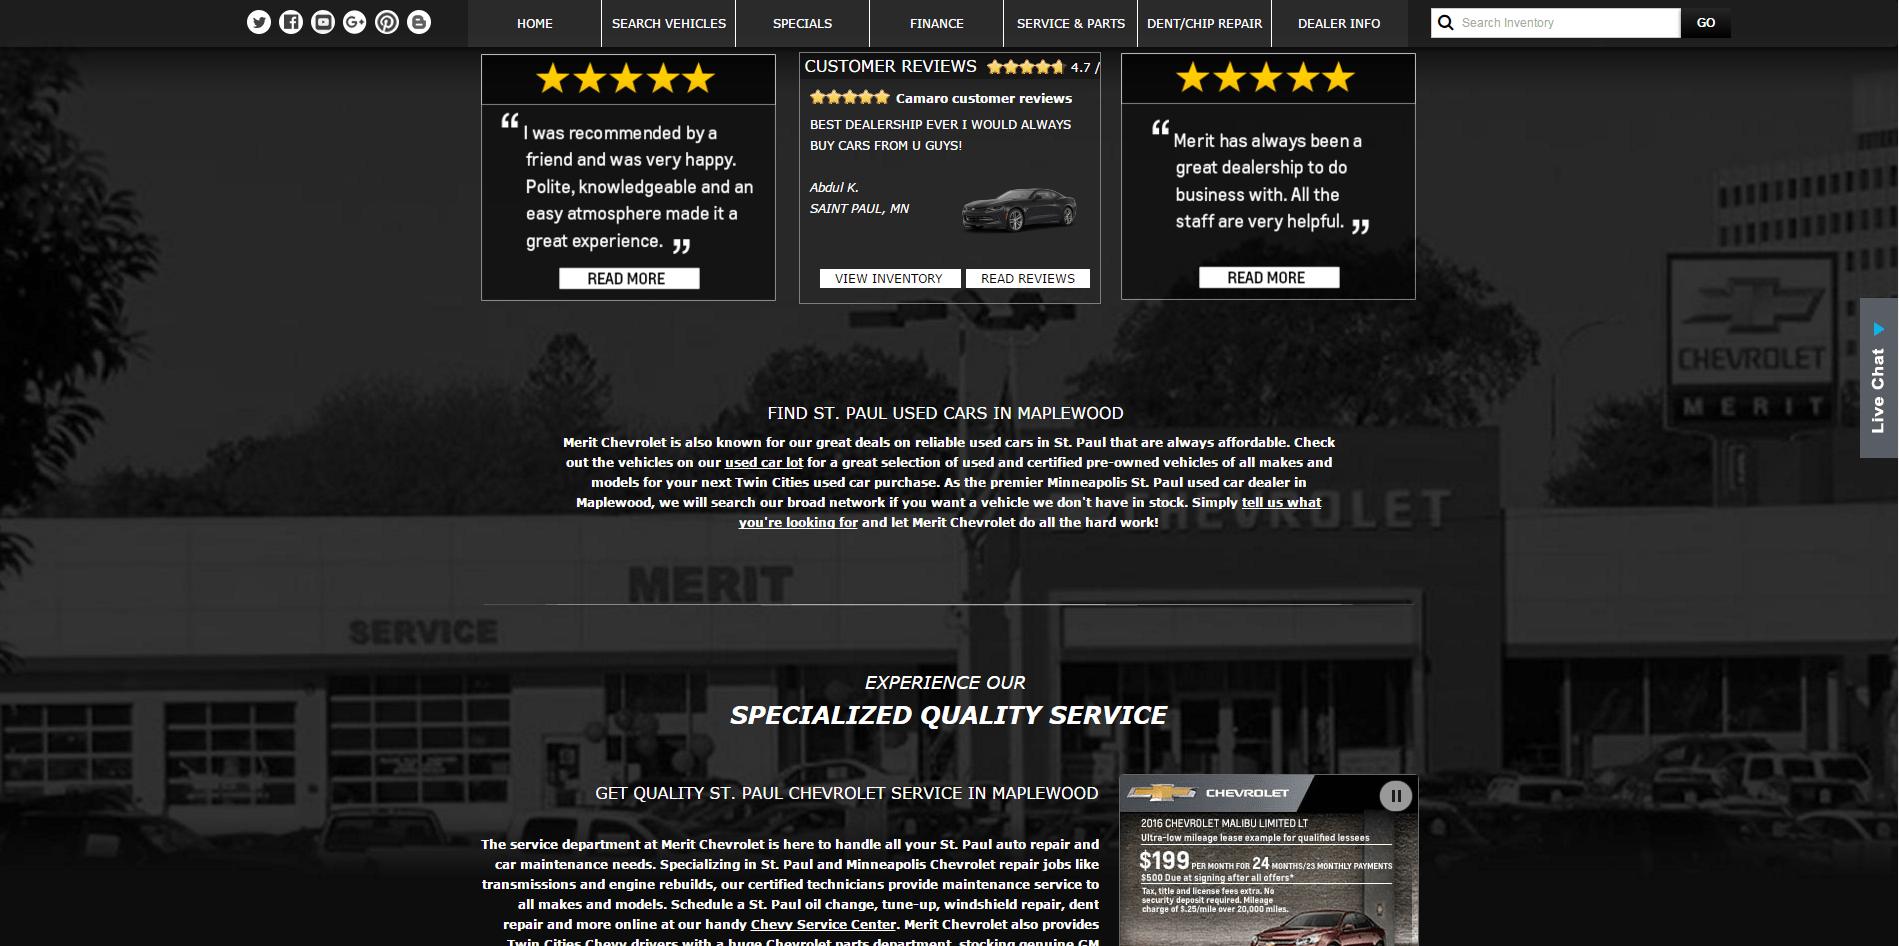 Merit Chevrolet (After) 1.4